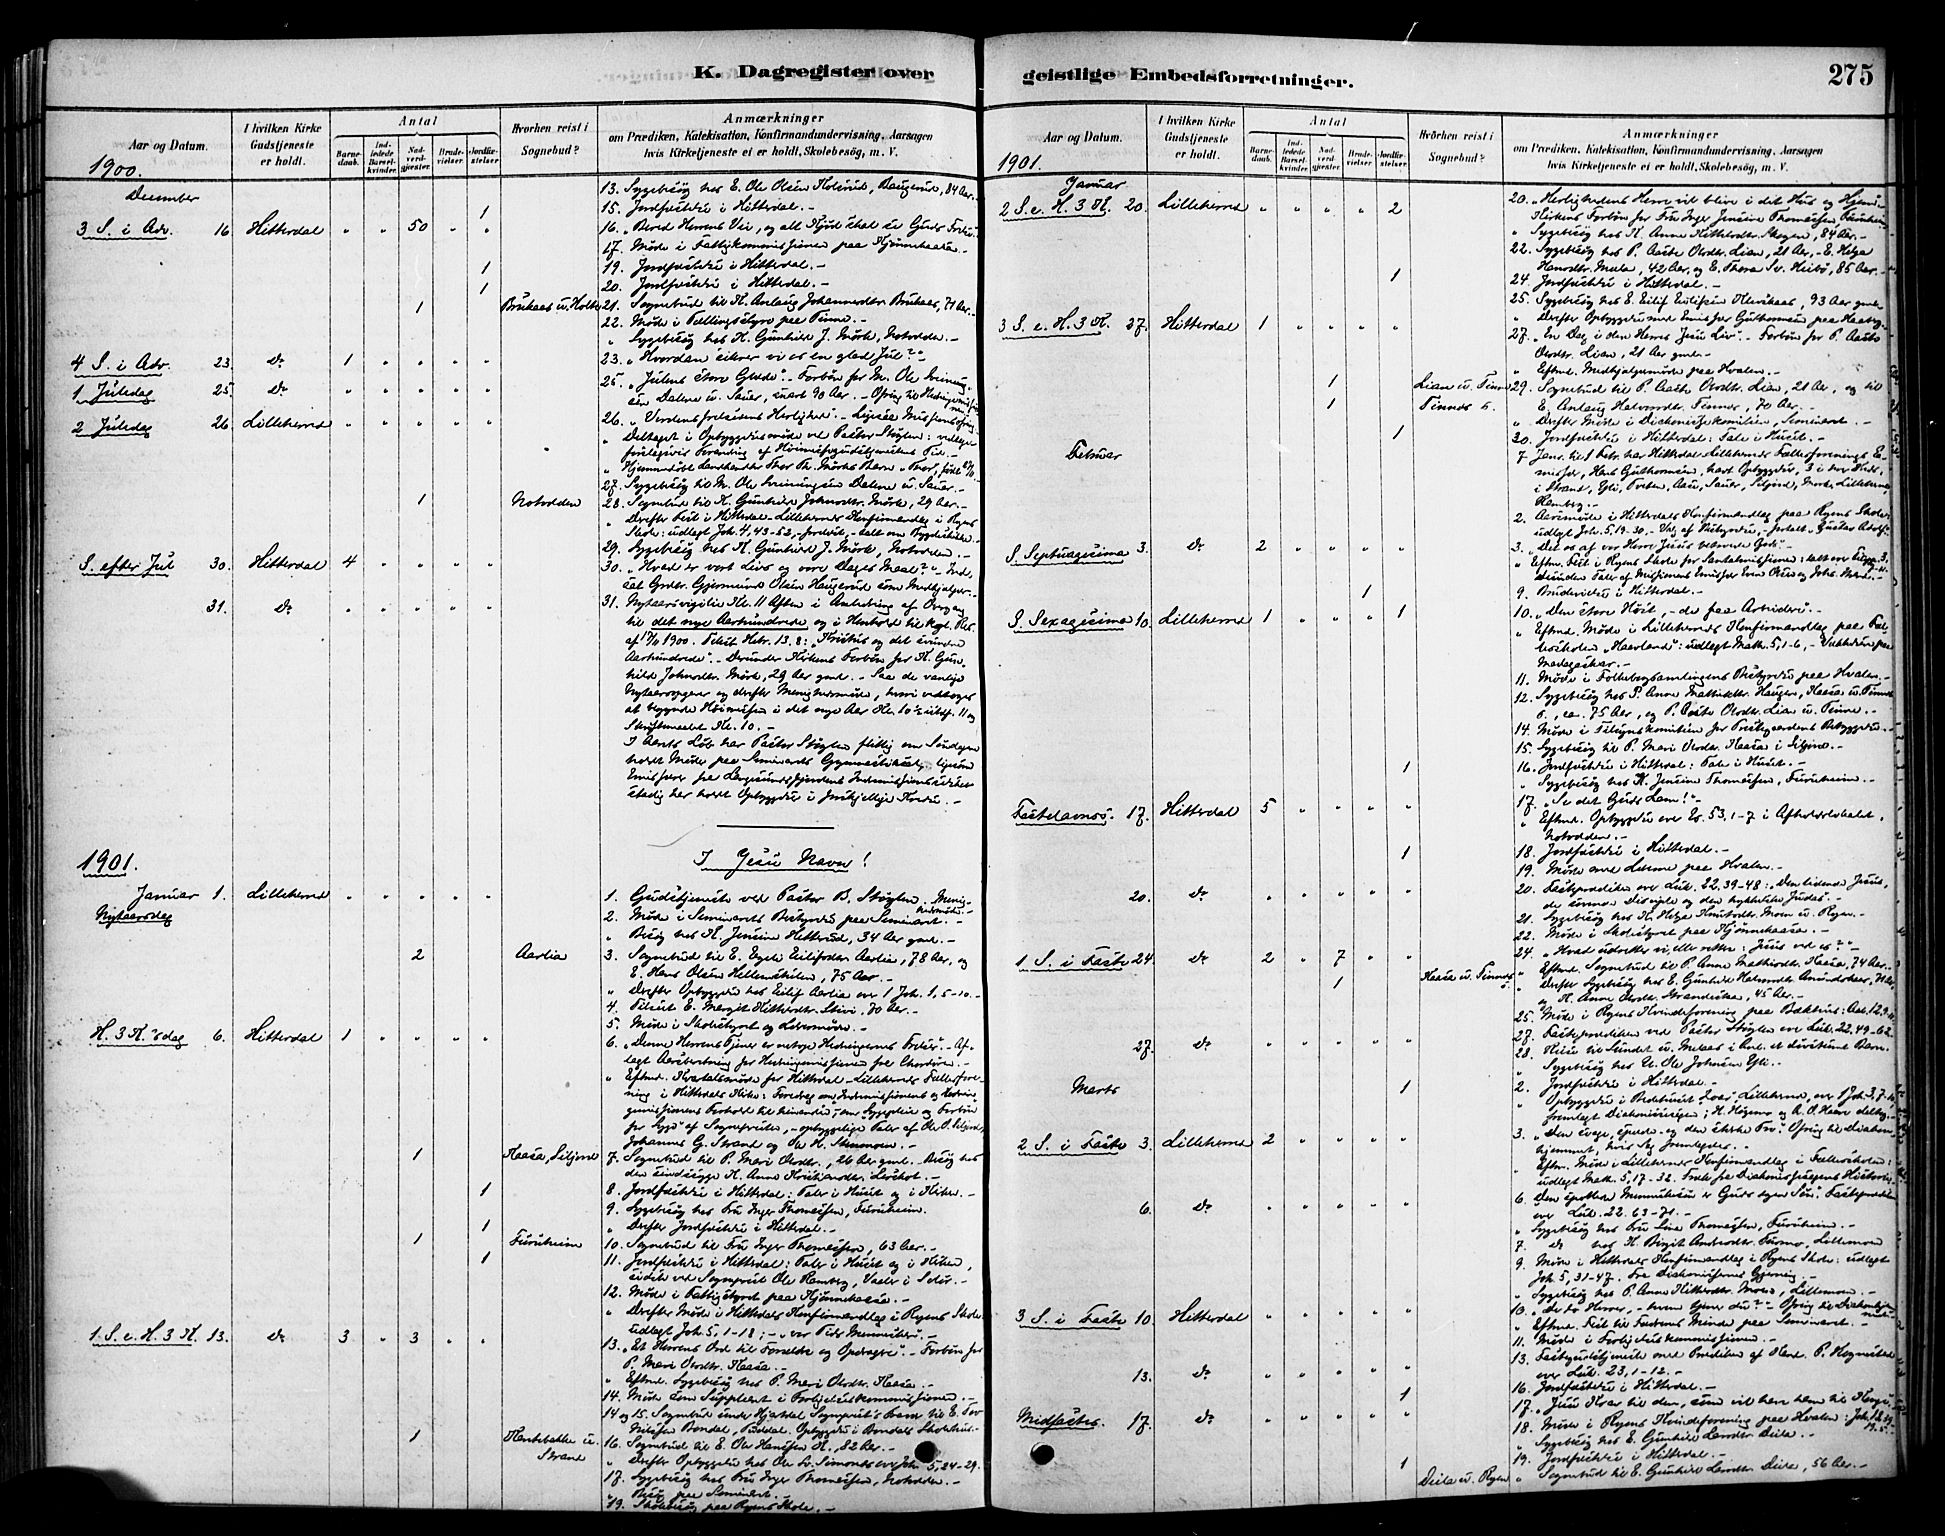 SAKO, Heddal kirkebøker, F/Fa/L0009: Parish register (official) no. I 9, 1878-1903, p. 275